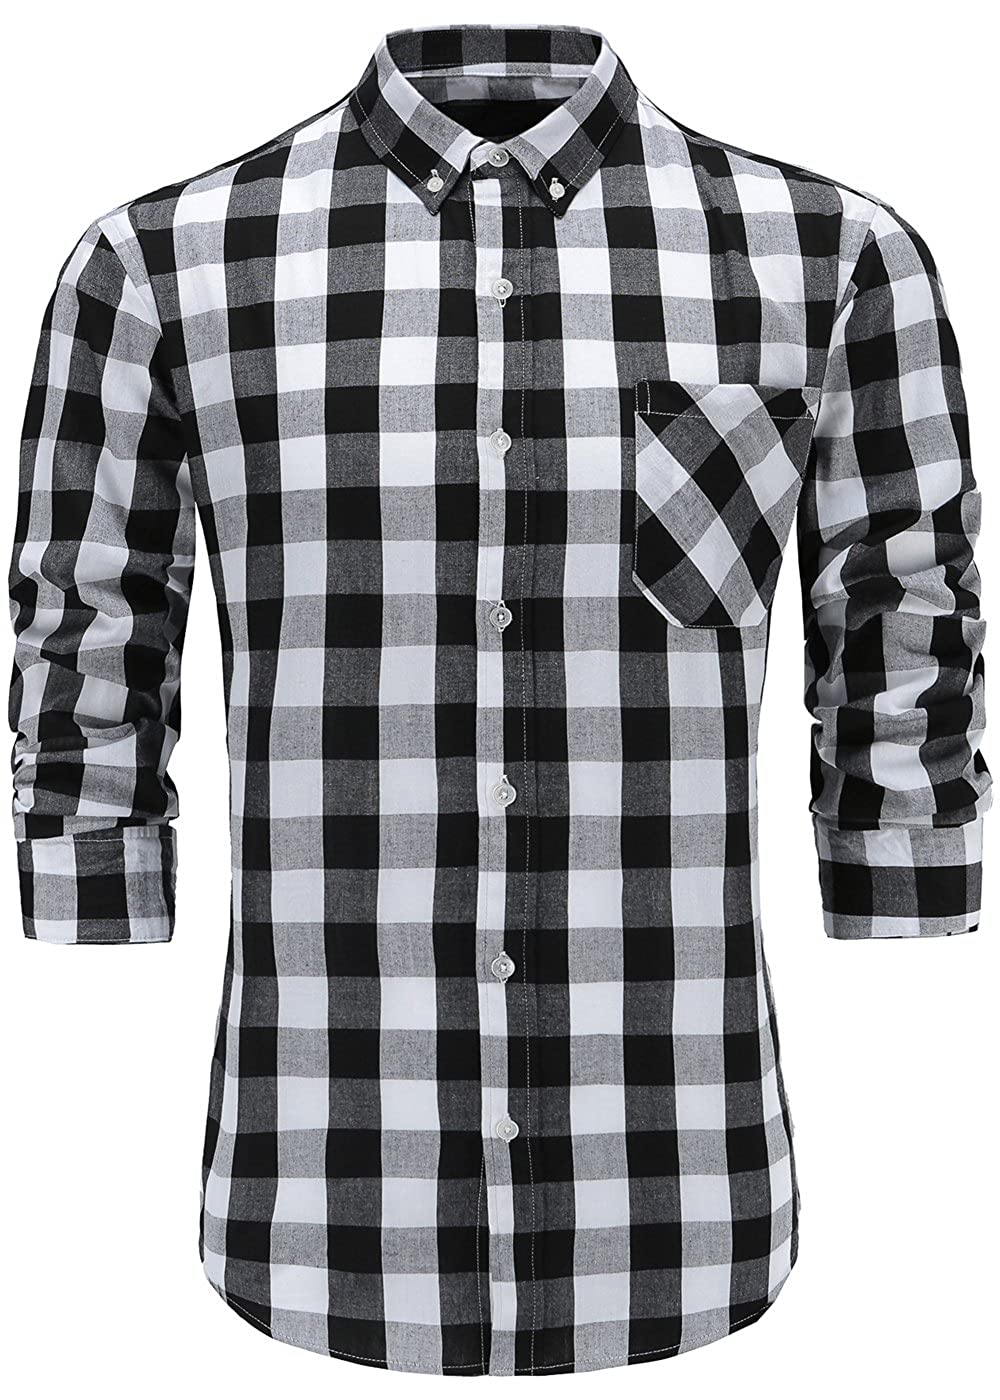 Katesui Mens Slim Fit Long Sleeve Button Down Plaid Dress Shirt At